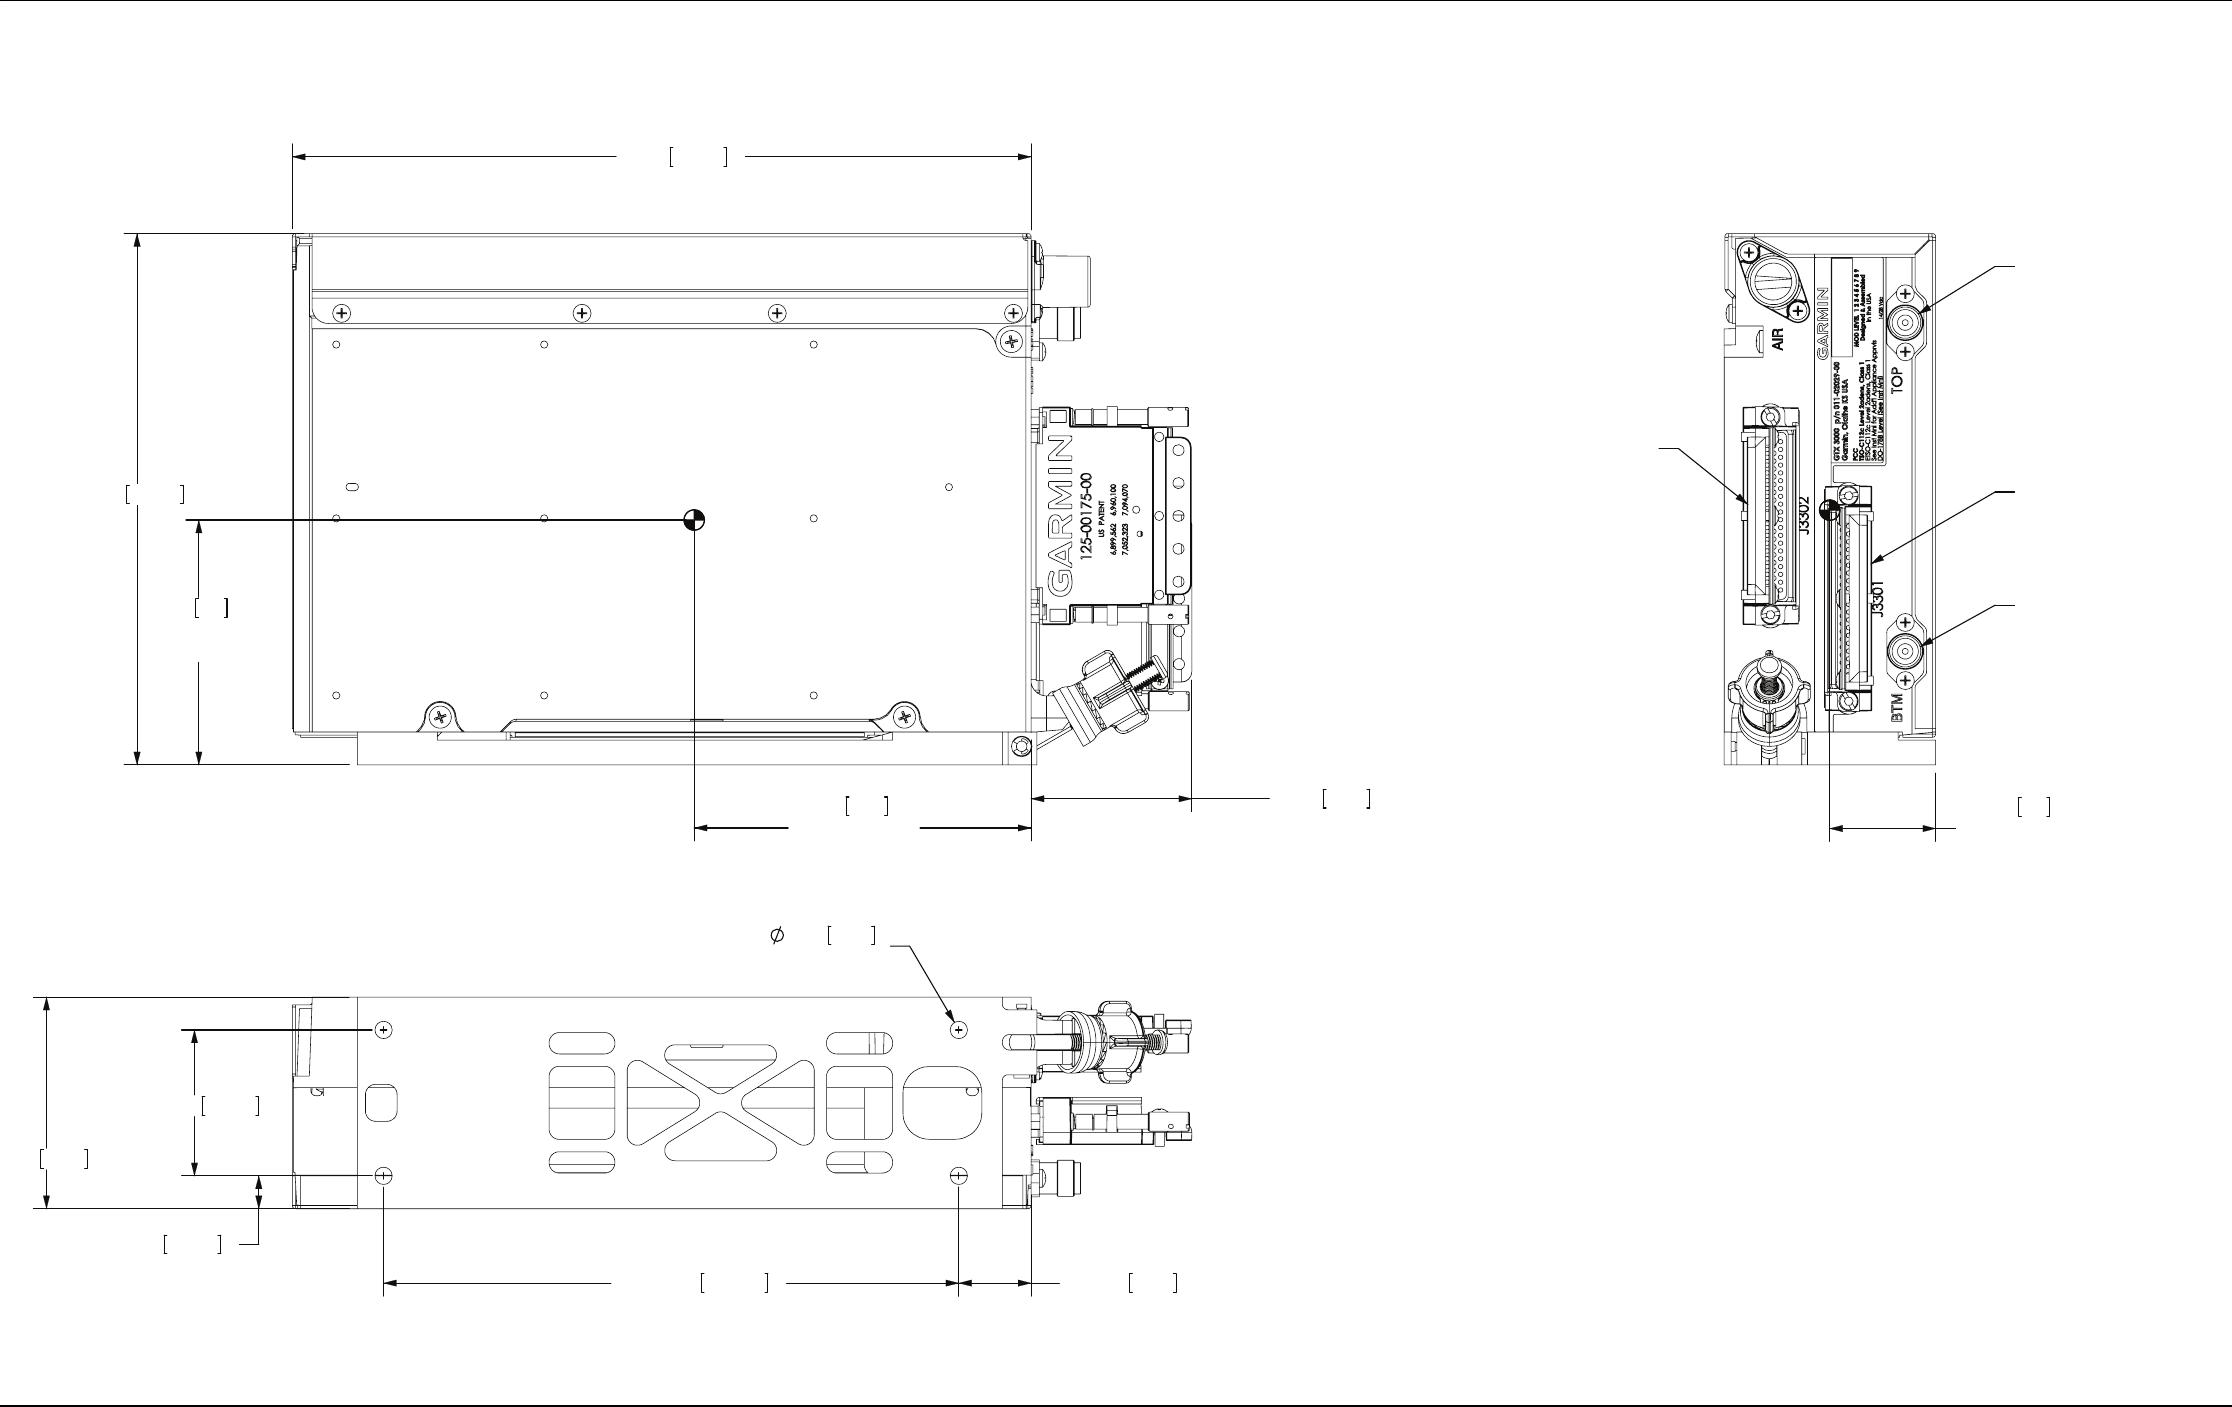 Garmin 01443 LICENSED NON-BROADCAST AERONAUTICAL TRANSMITTER User